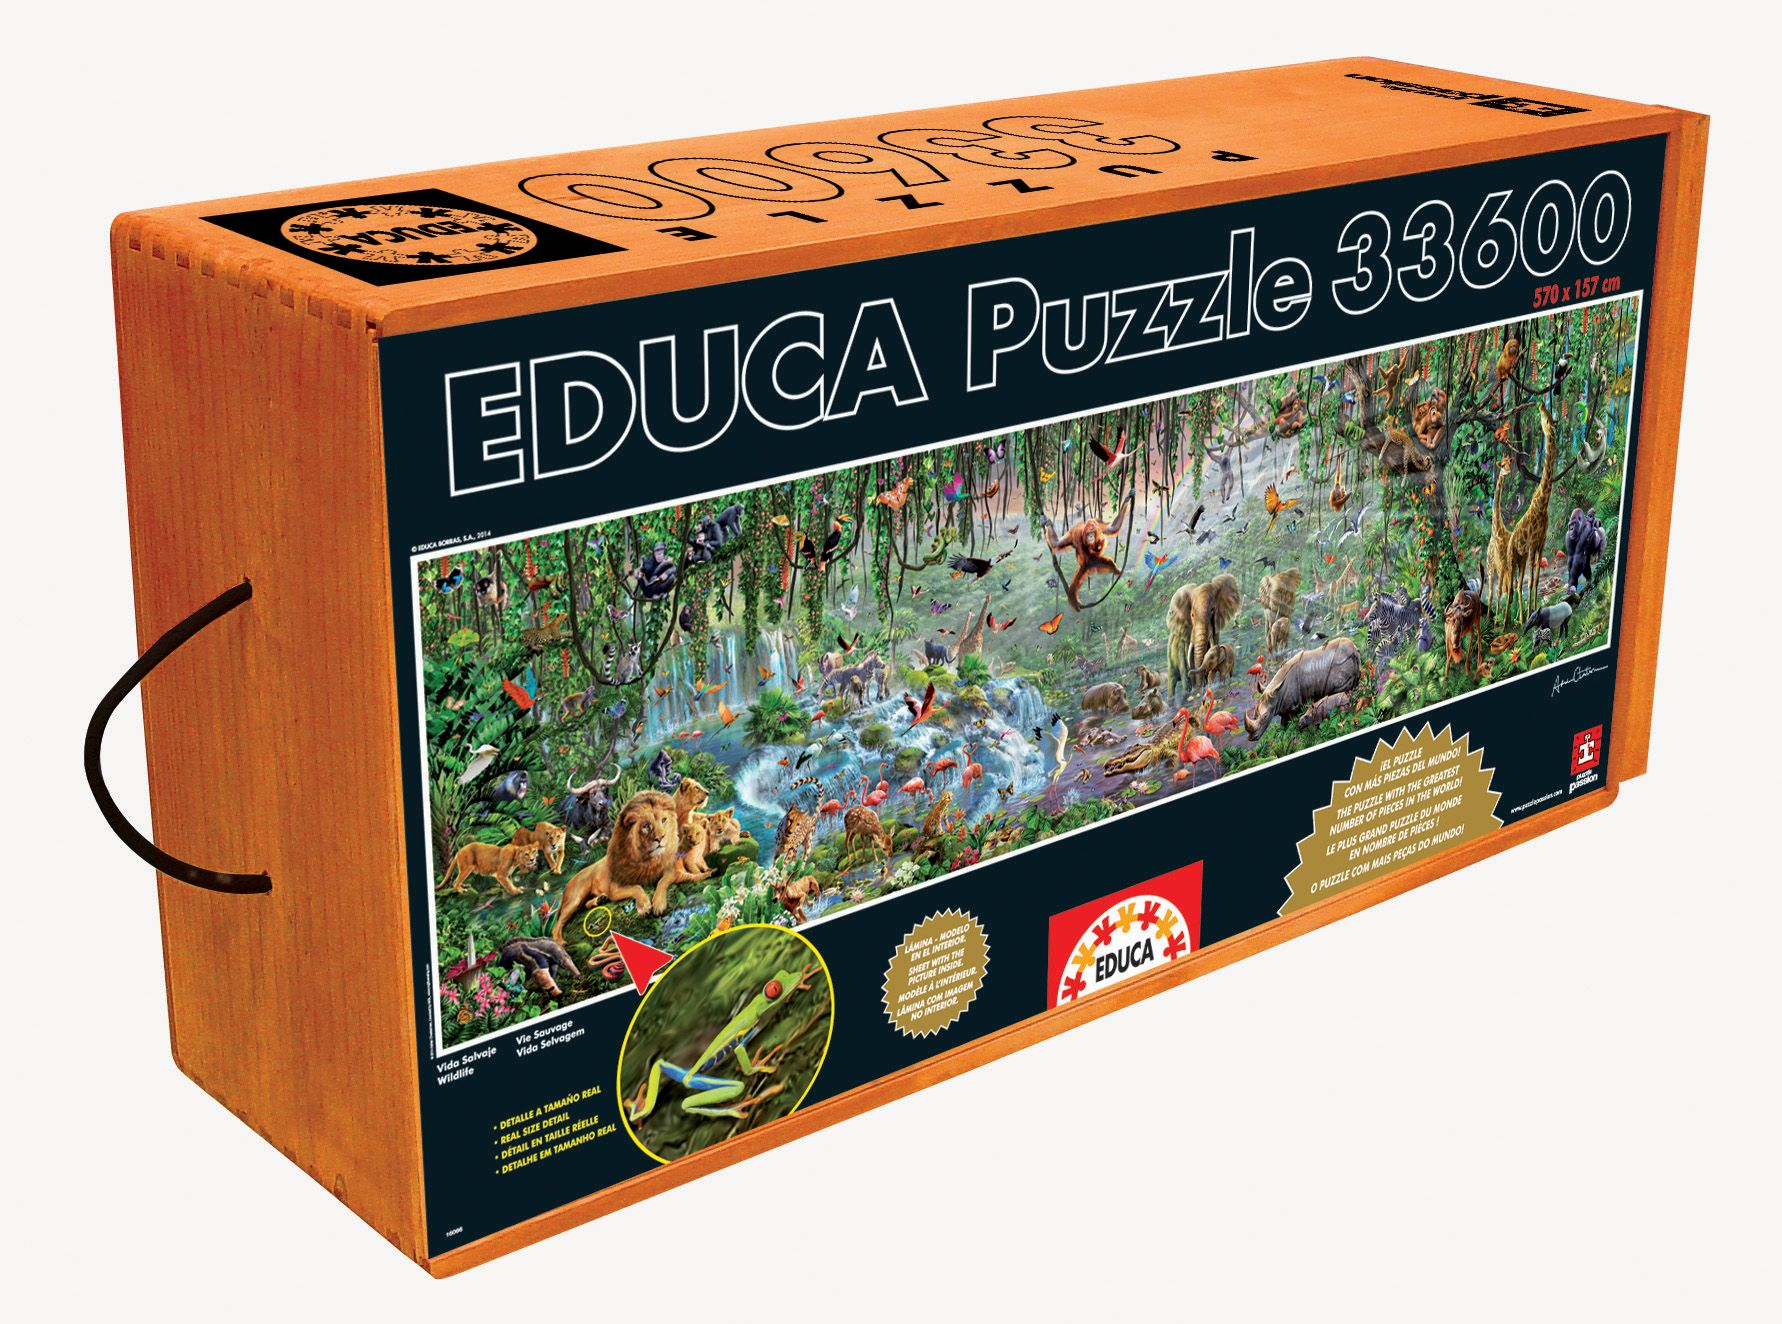 Wildlife 33 600 Pieces Puzzlewarehouse Com Jigsaw Puzzles Disney Puzzles Board Game Room